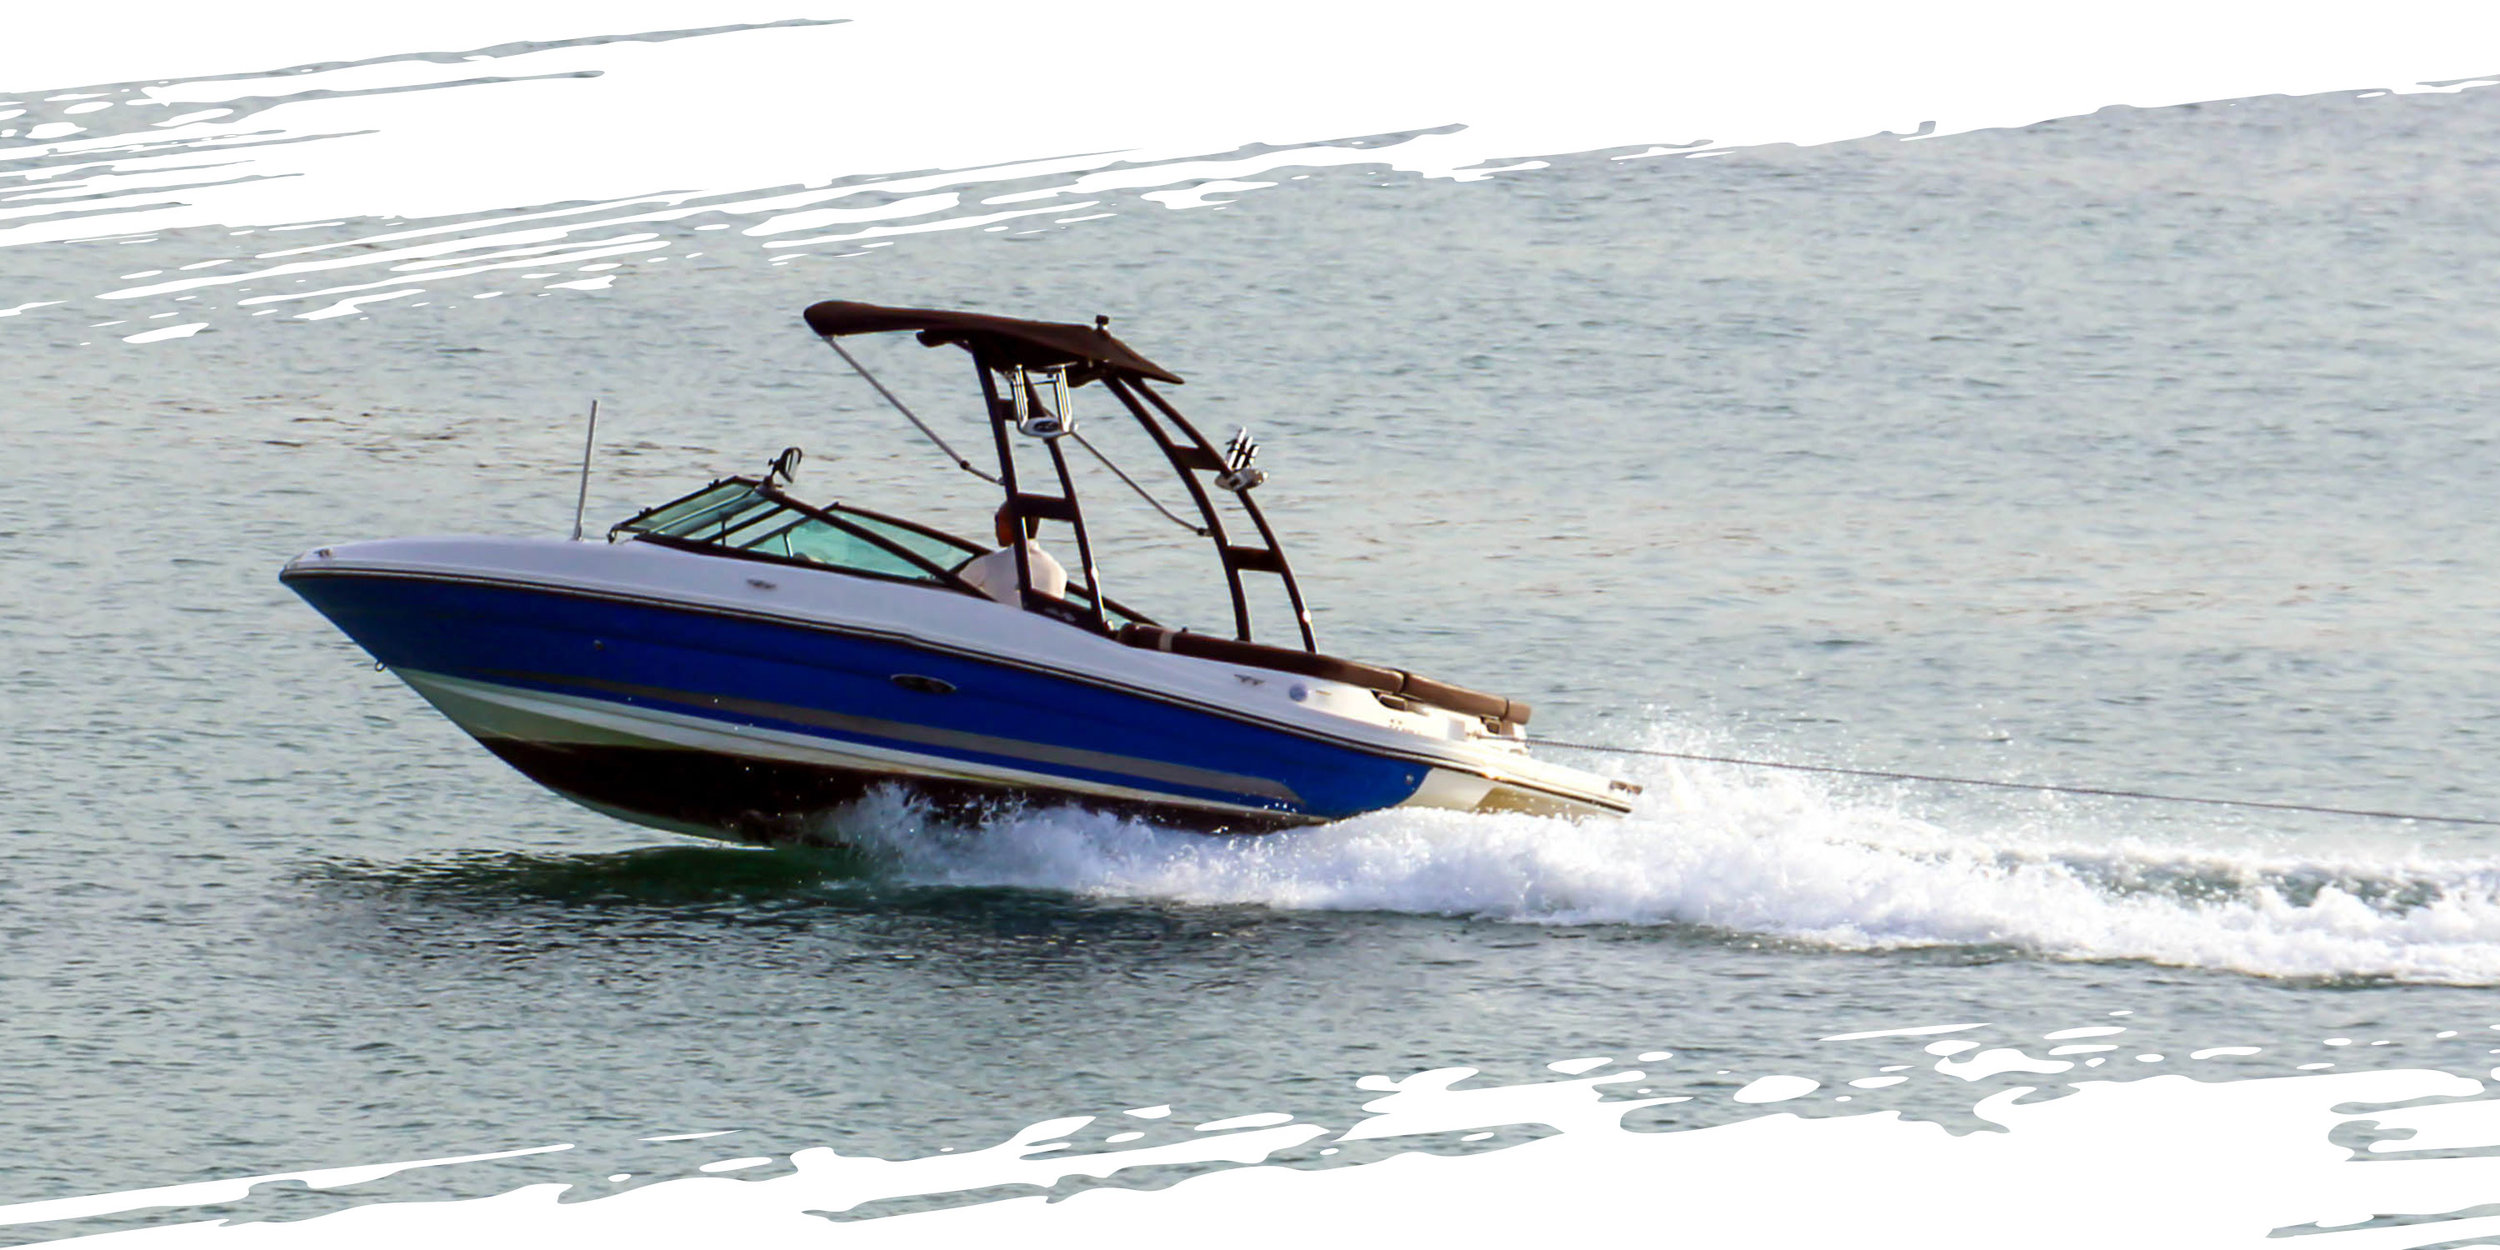 seaforth_header_powerboats-v2.jpg